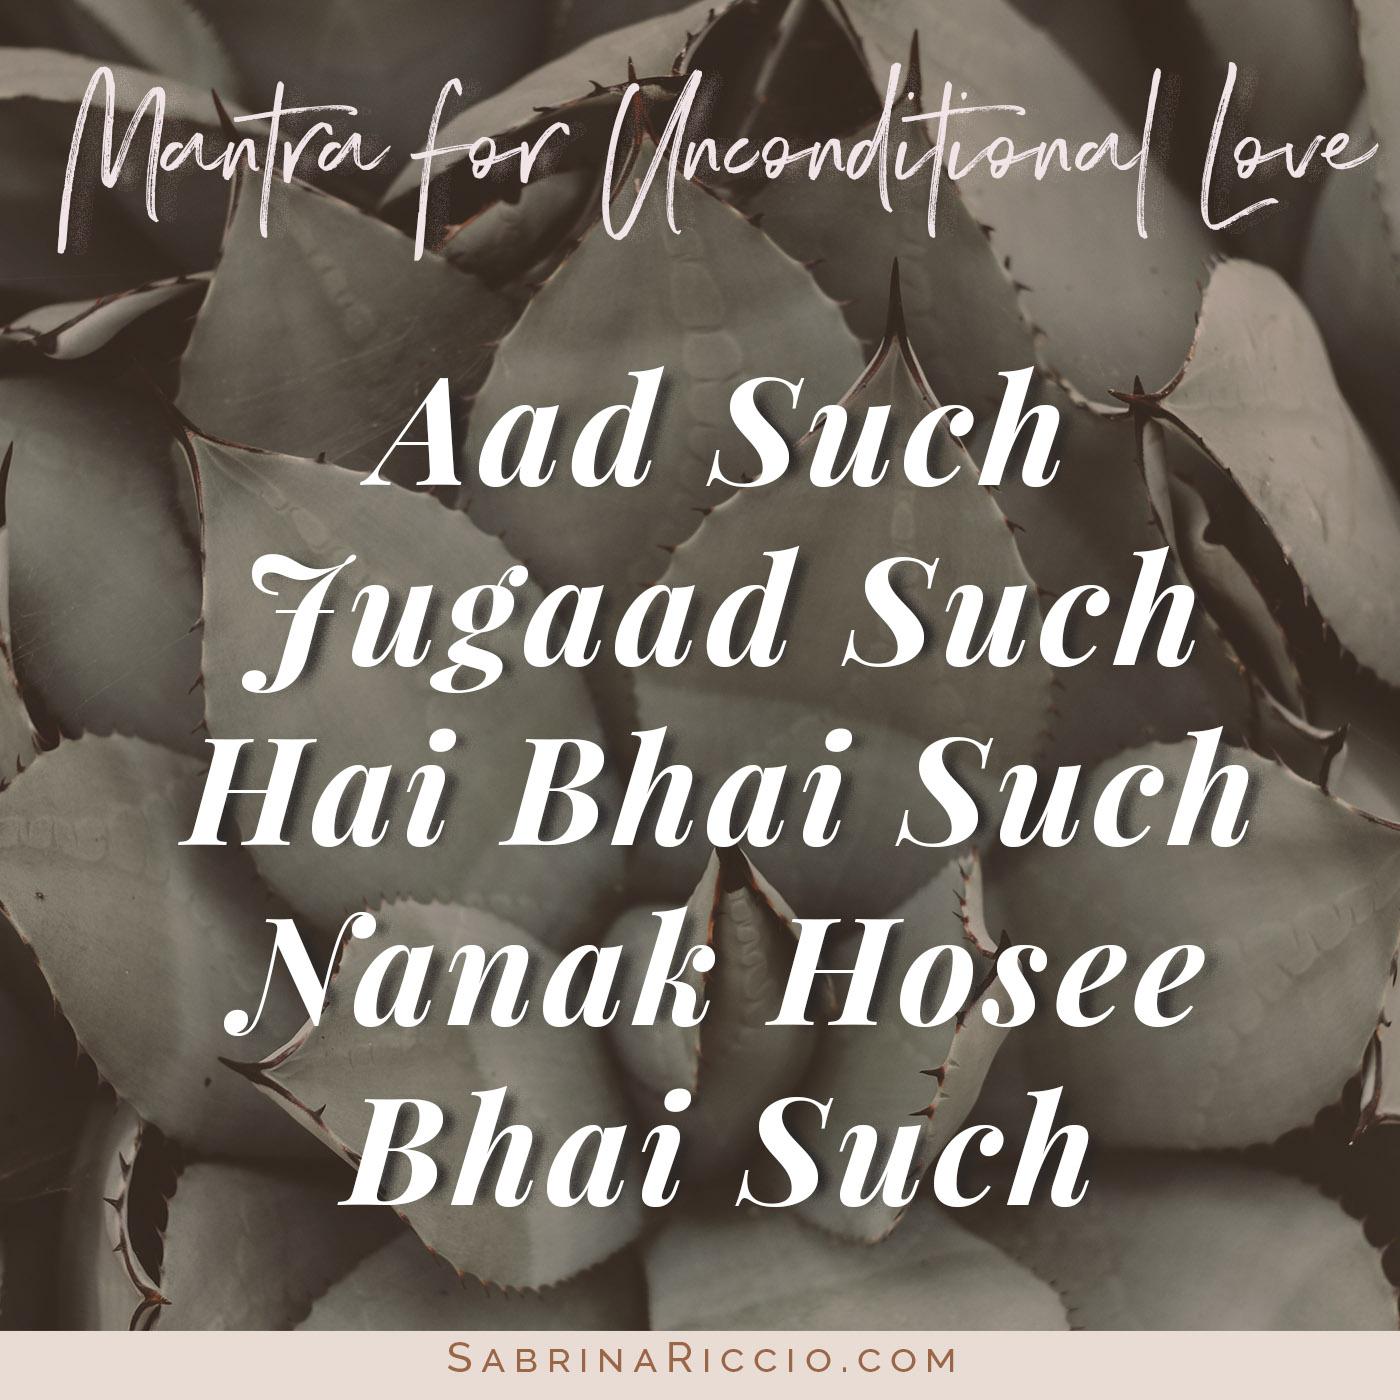 Aad Such Jugaad Such Hai Bhai Such   Mantra for Unconditional Love   SabrinaRiccio.com